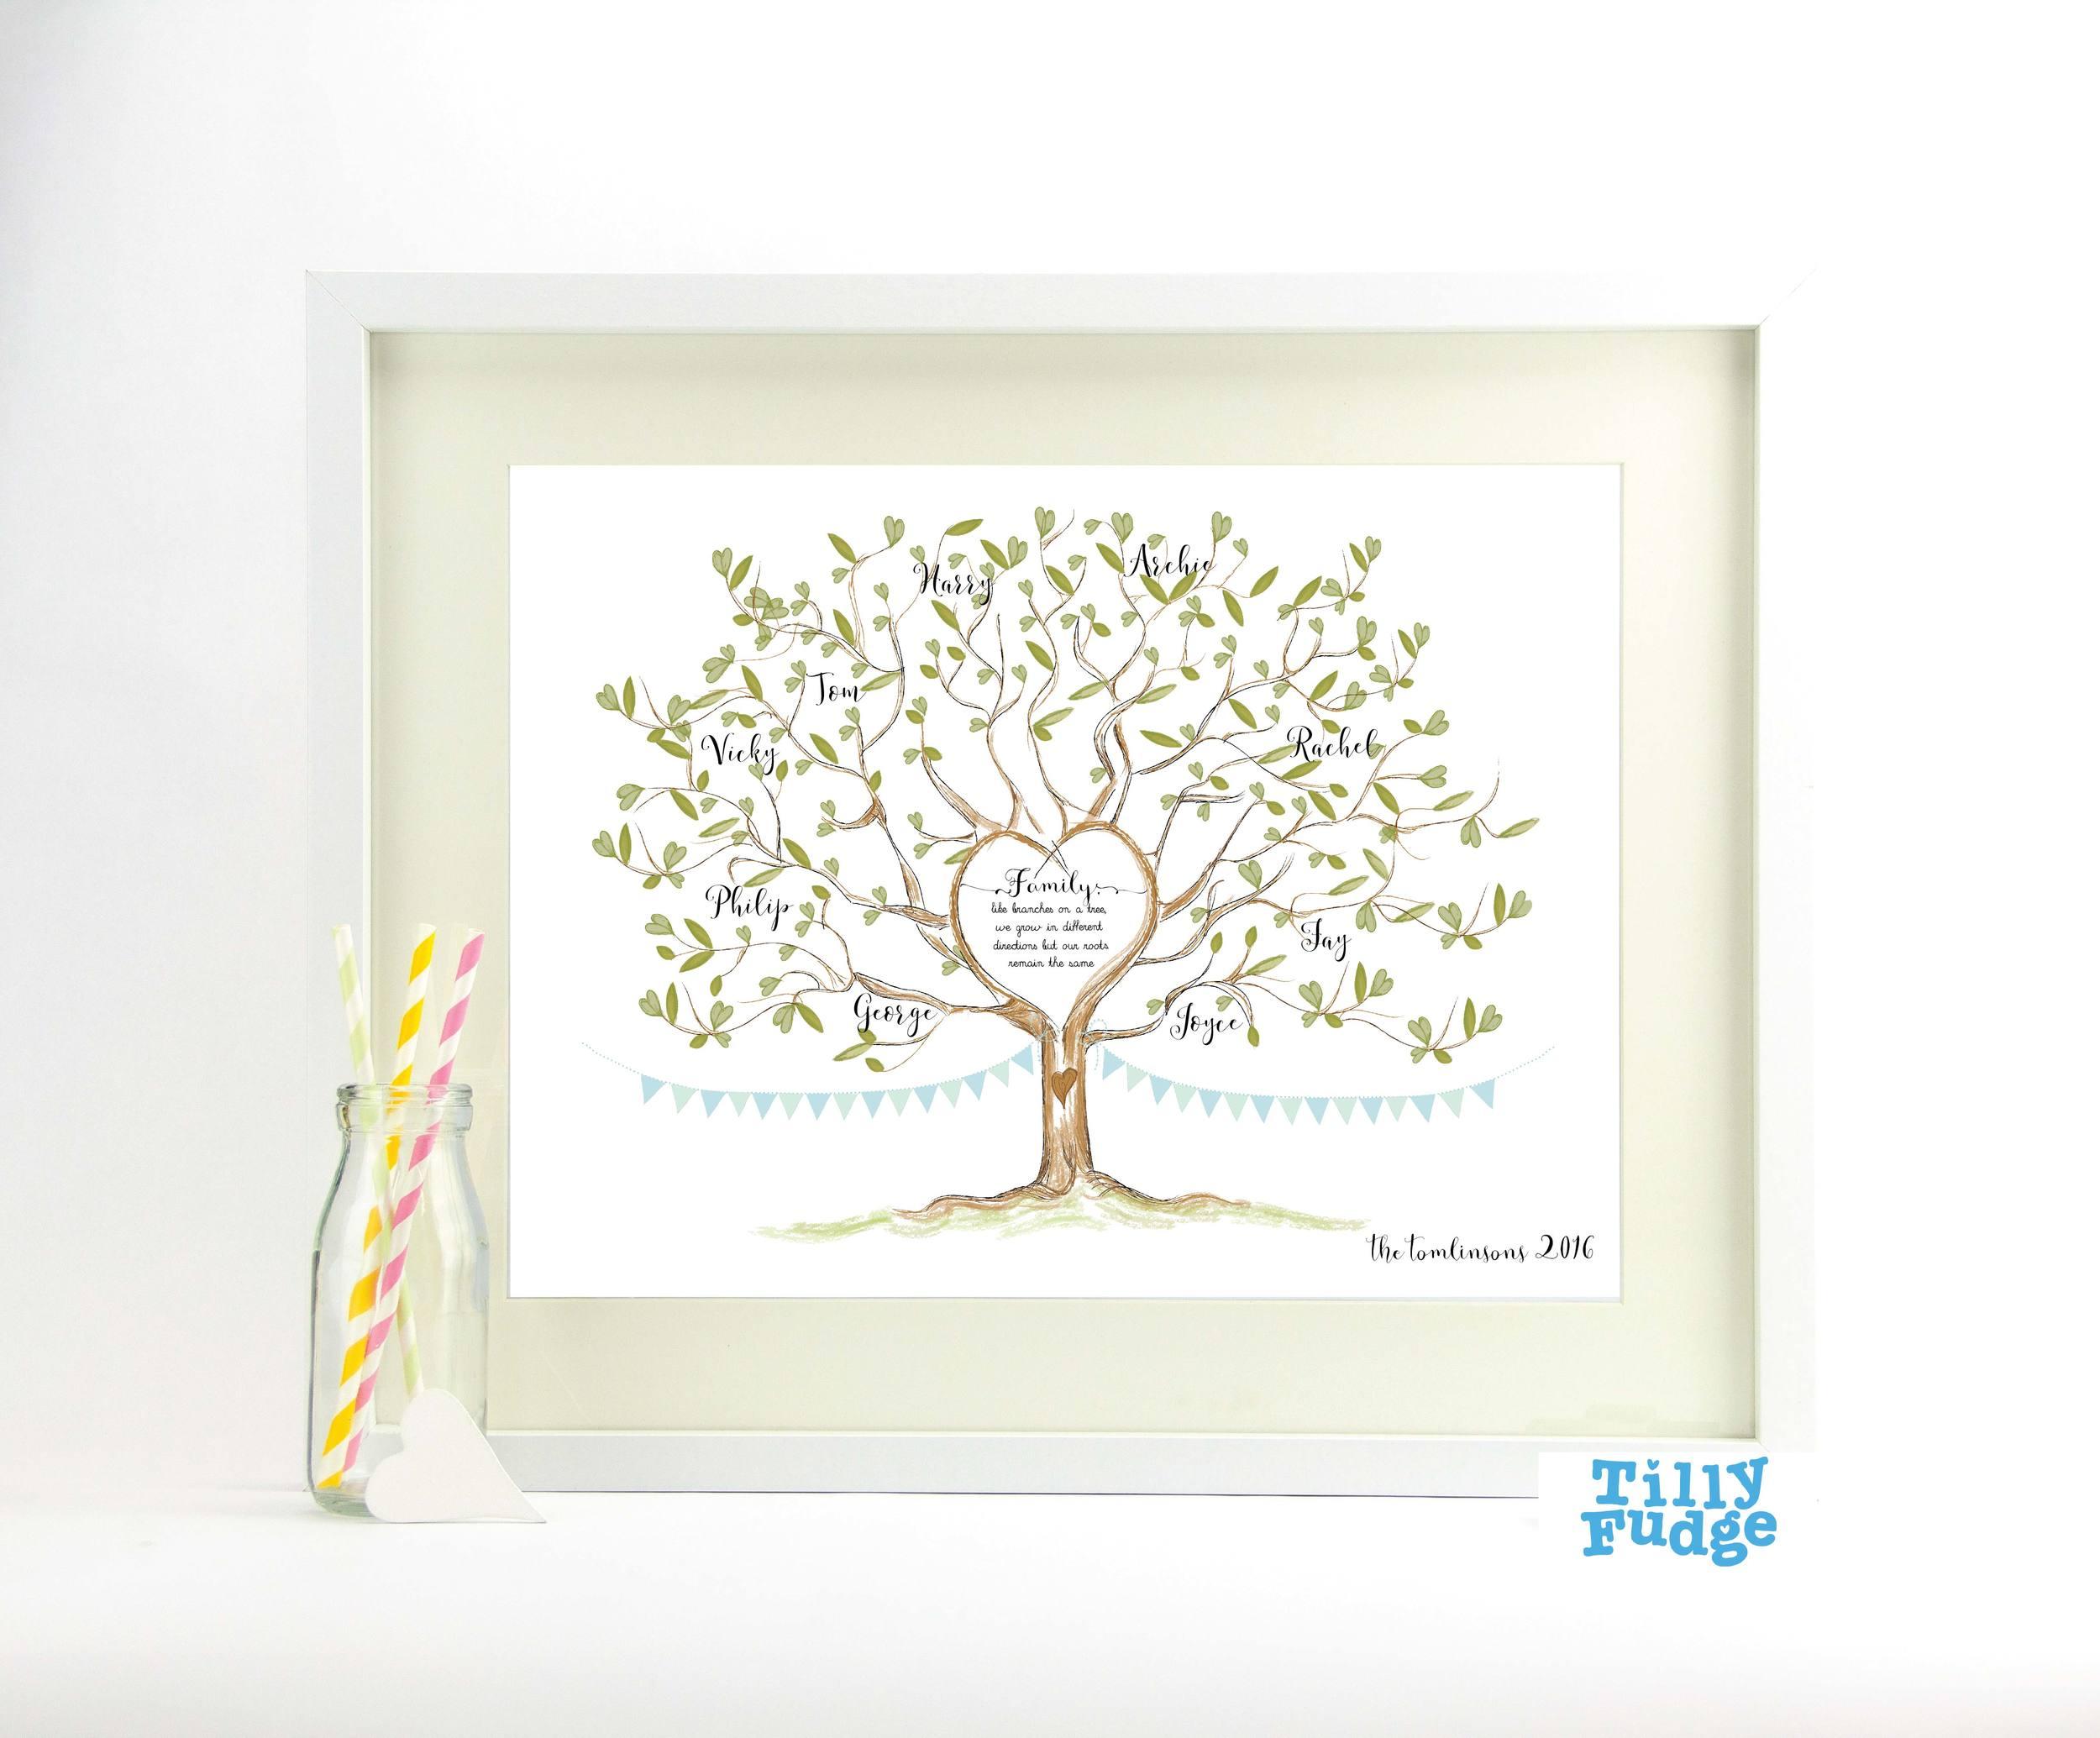 family tree heart with frame.jpg